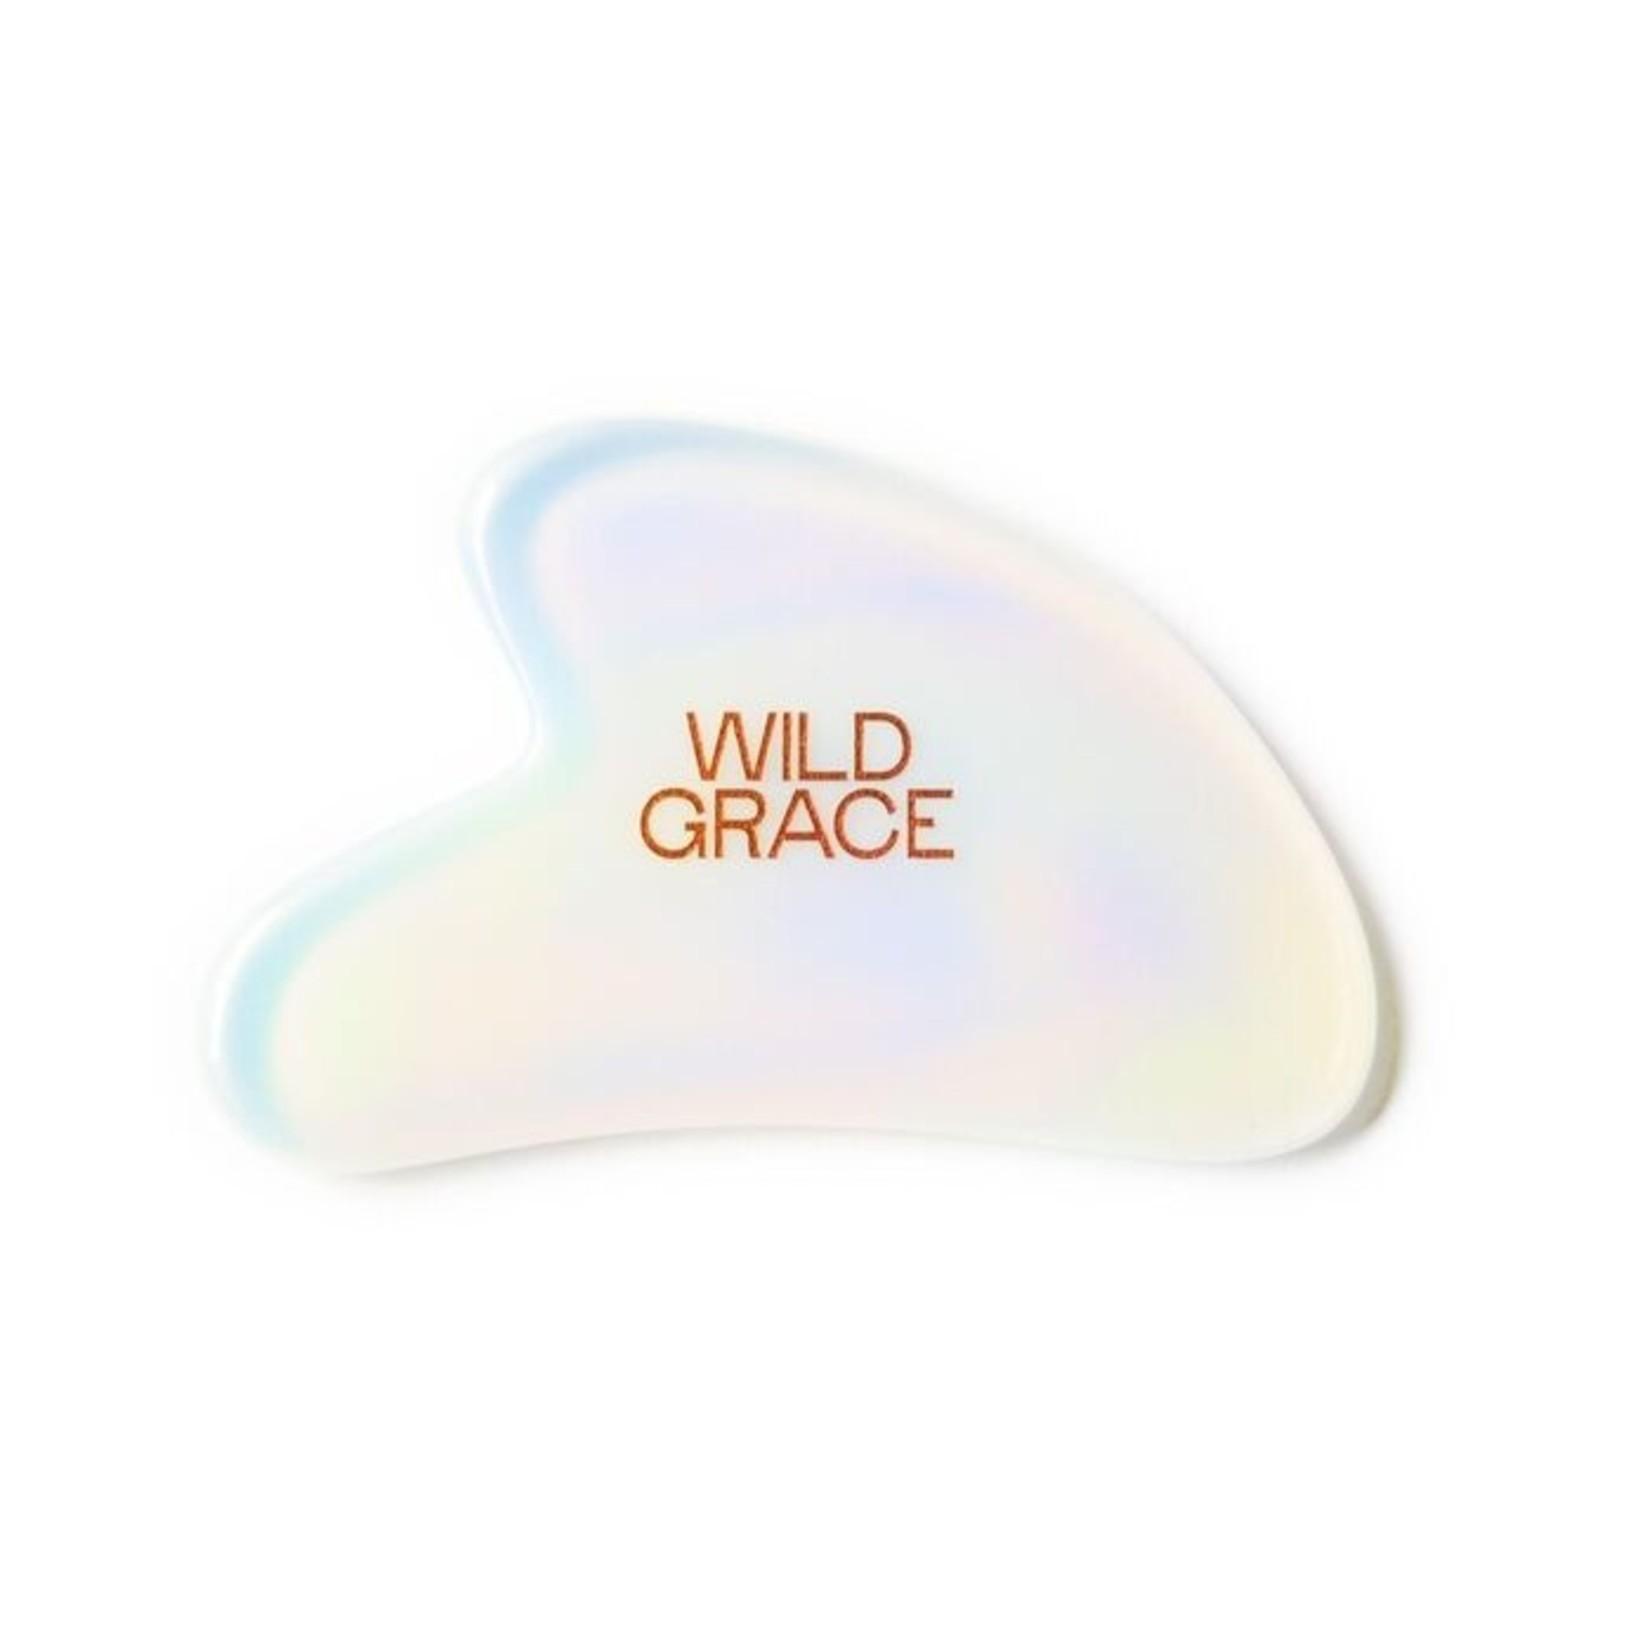 Gua sha opalite - Wild Grace